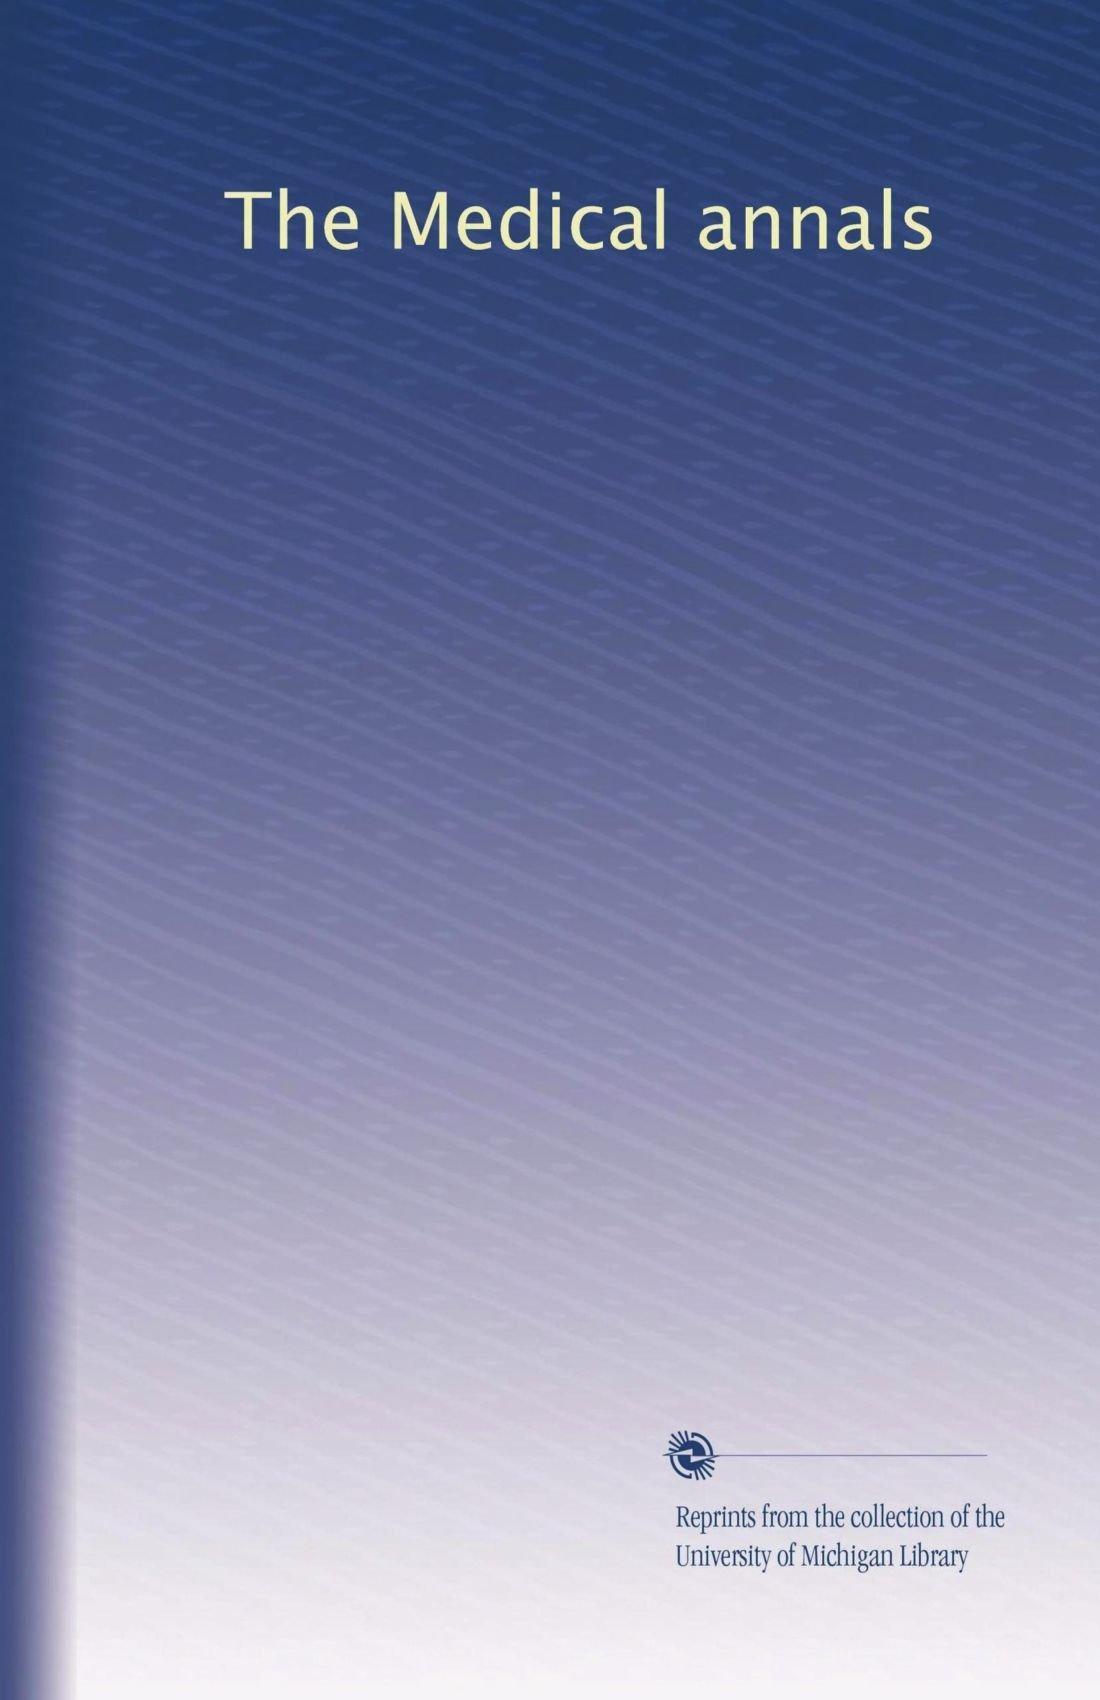 The Medical annals (Volume 3) PDF ePub fb2 book